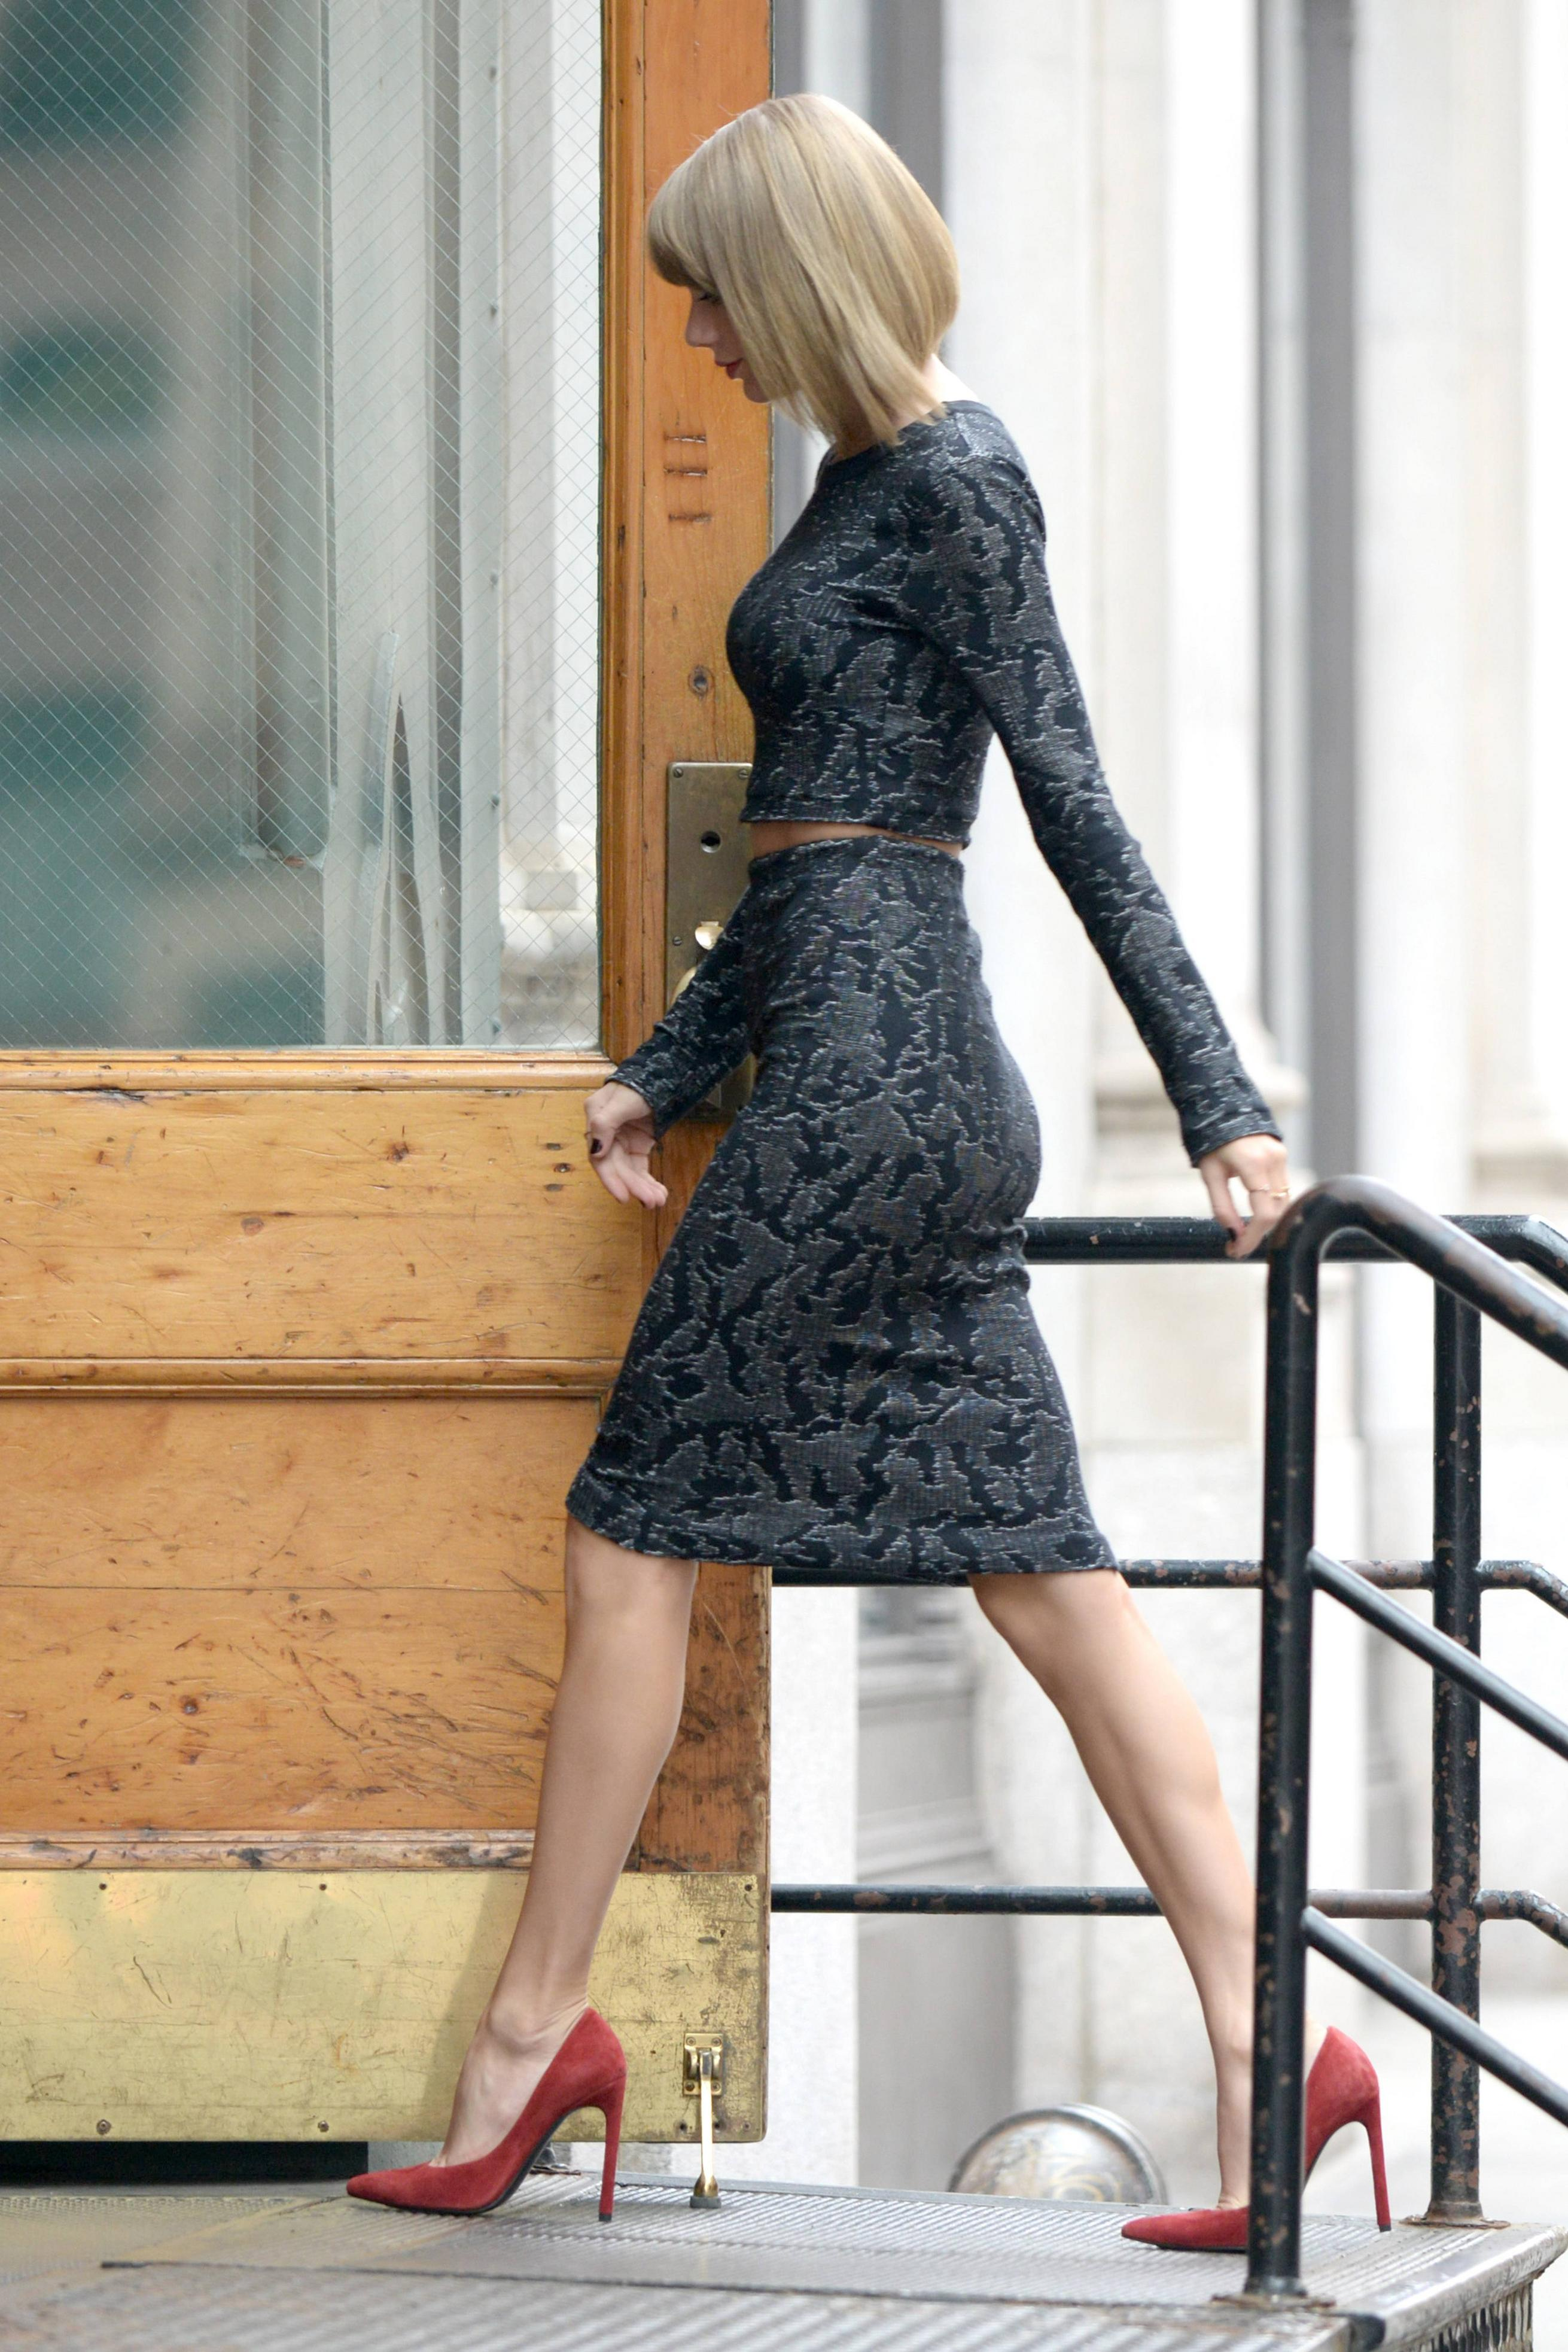 Taylor Swift leaked naked